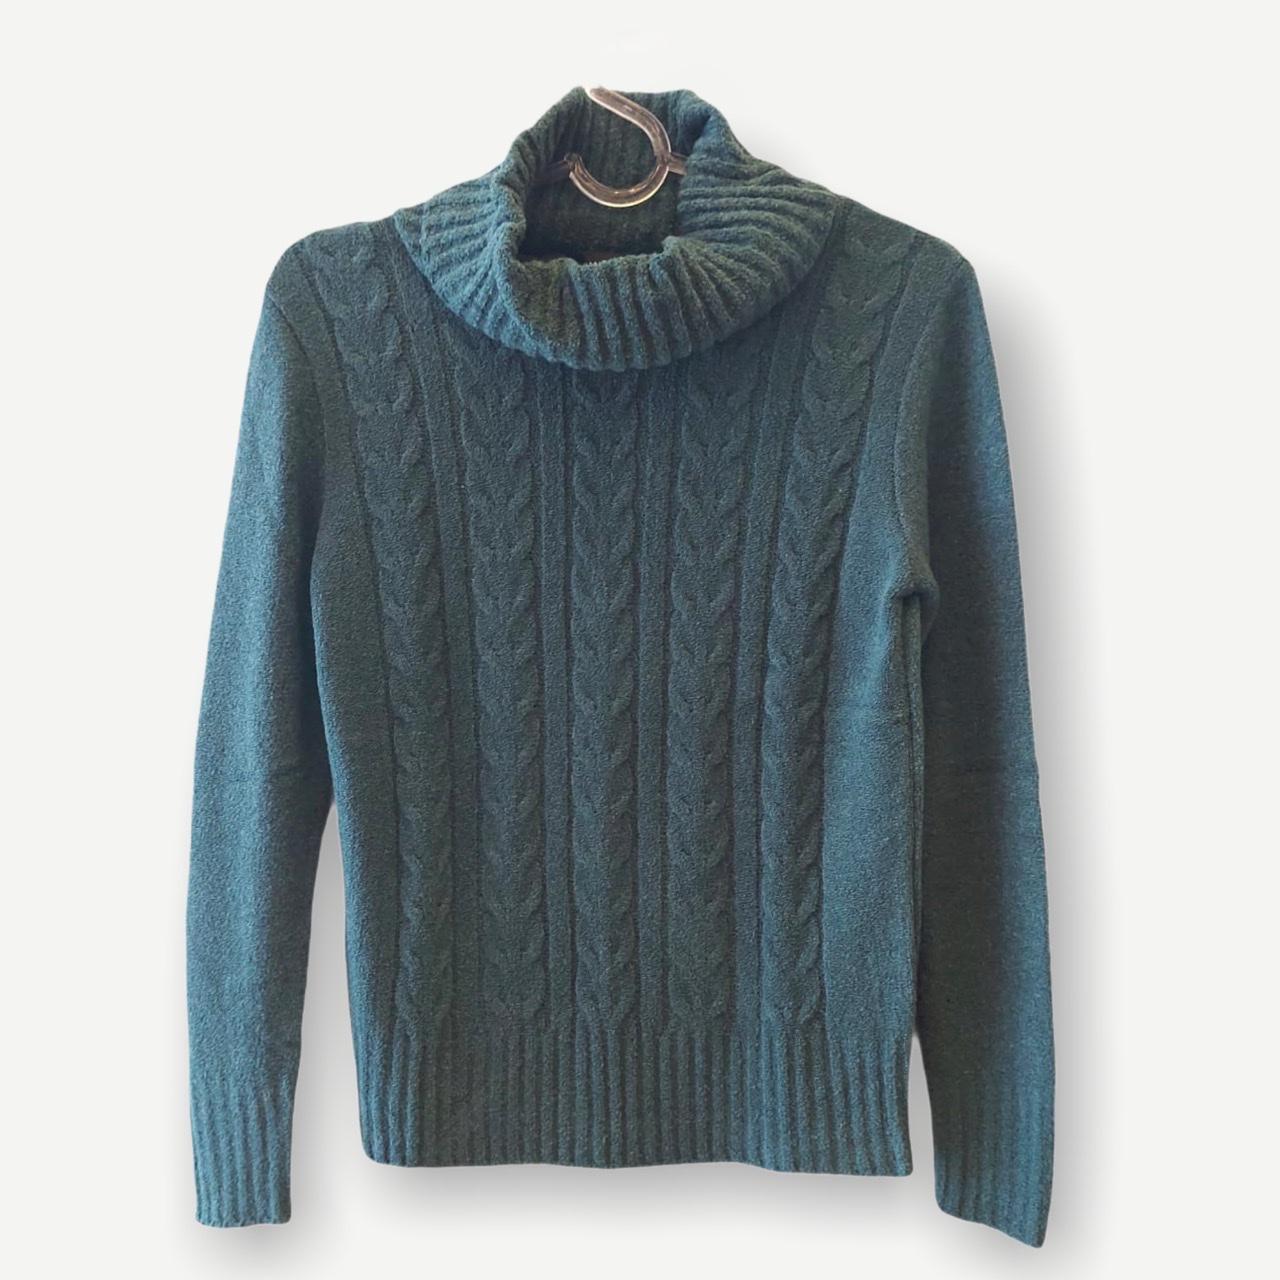 Blusa Rebeca verde tricot  - Vivian Bógus